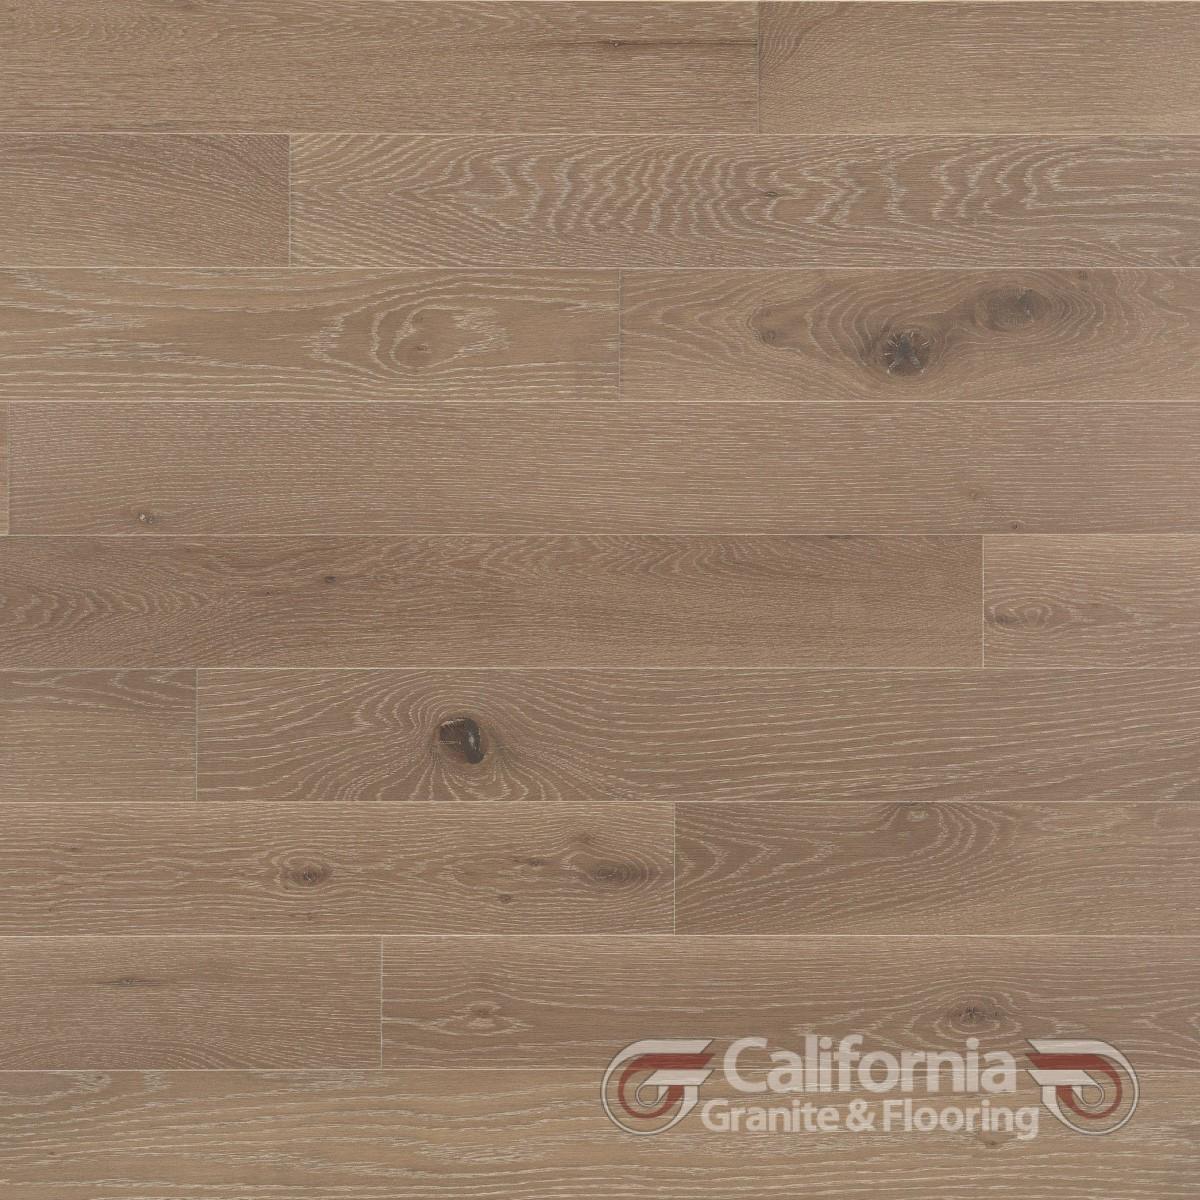 hardwood-flooring-white-oak-sand-castle-character-brushed-2